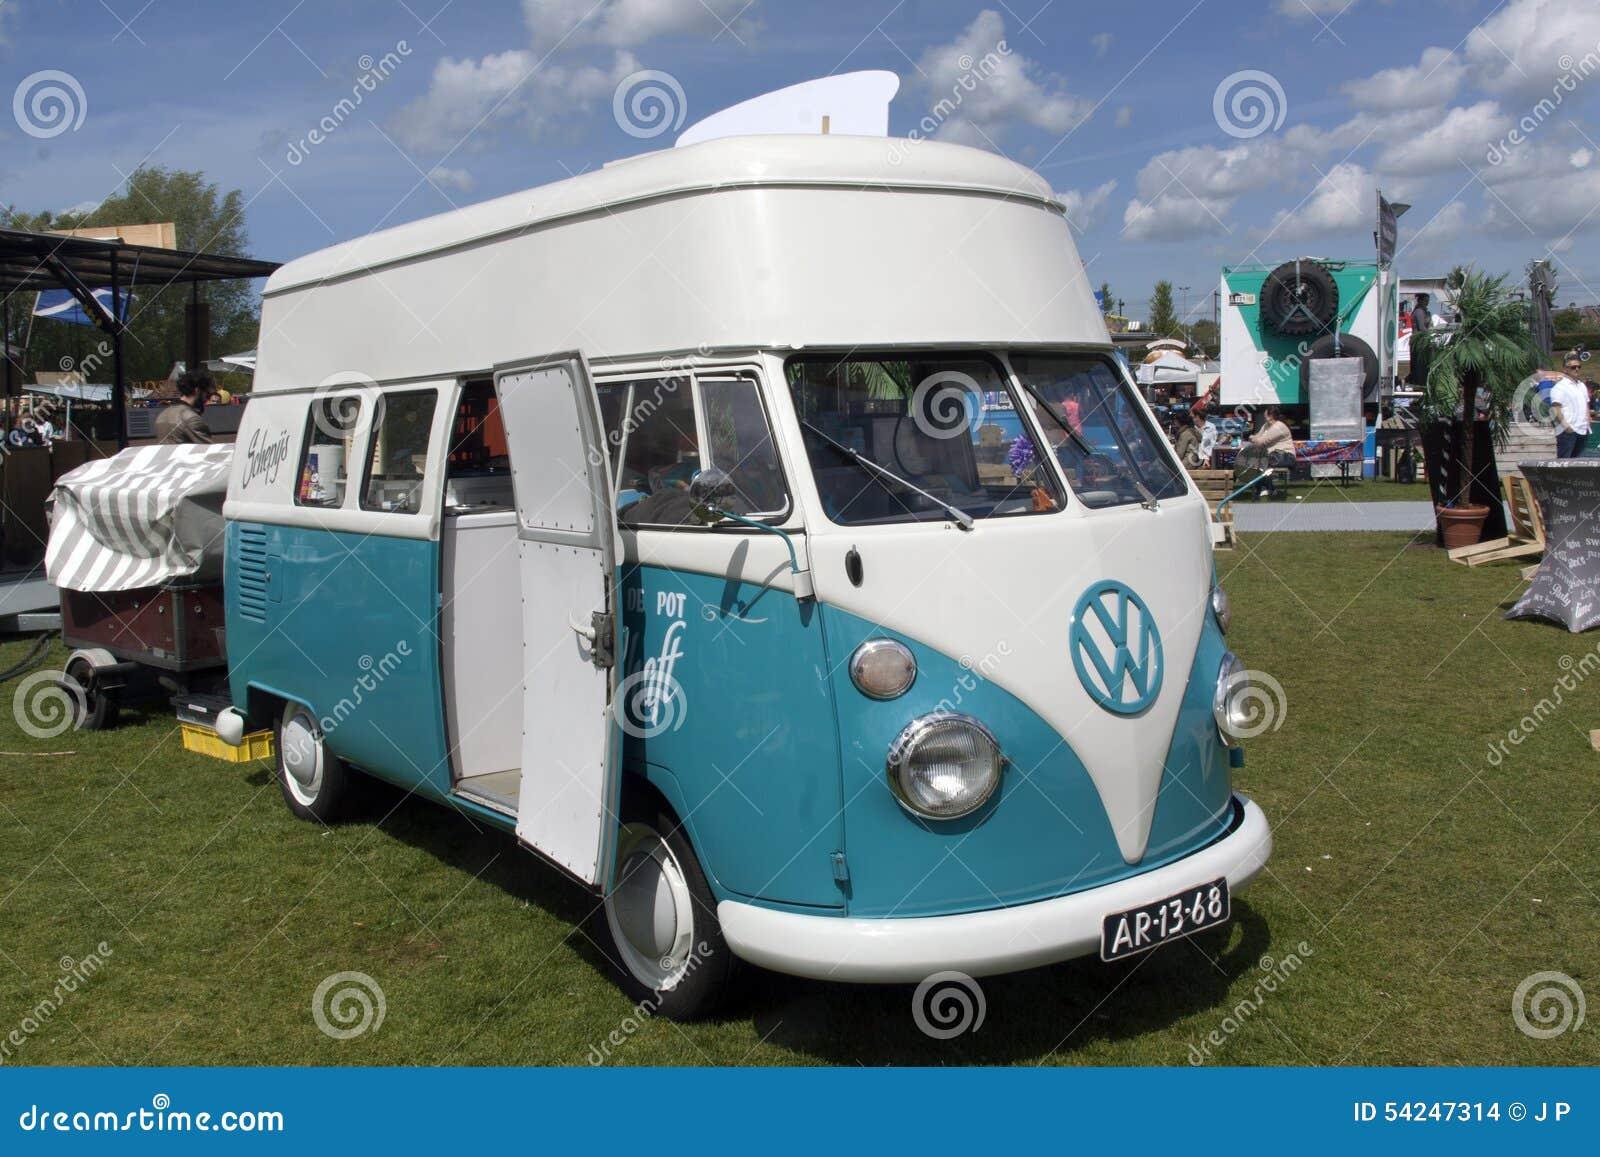 volkswagen t1 ice cream van editorial stock image image. Black Bedroom Furniture Sets. Home Design Ideas